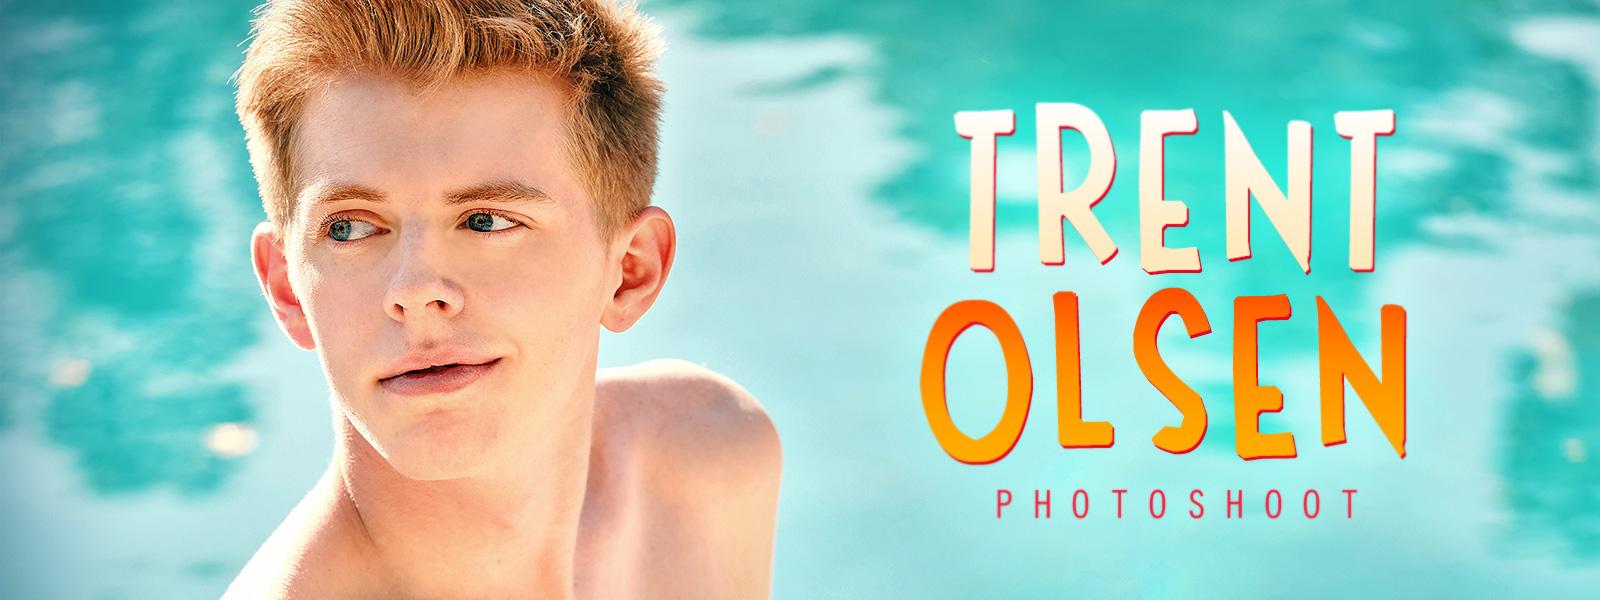 Trent Olsen Photoshoot